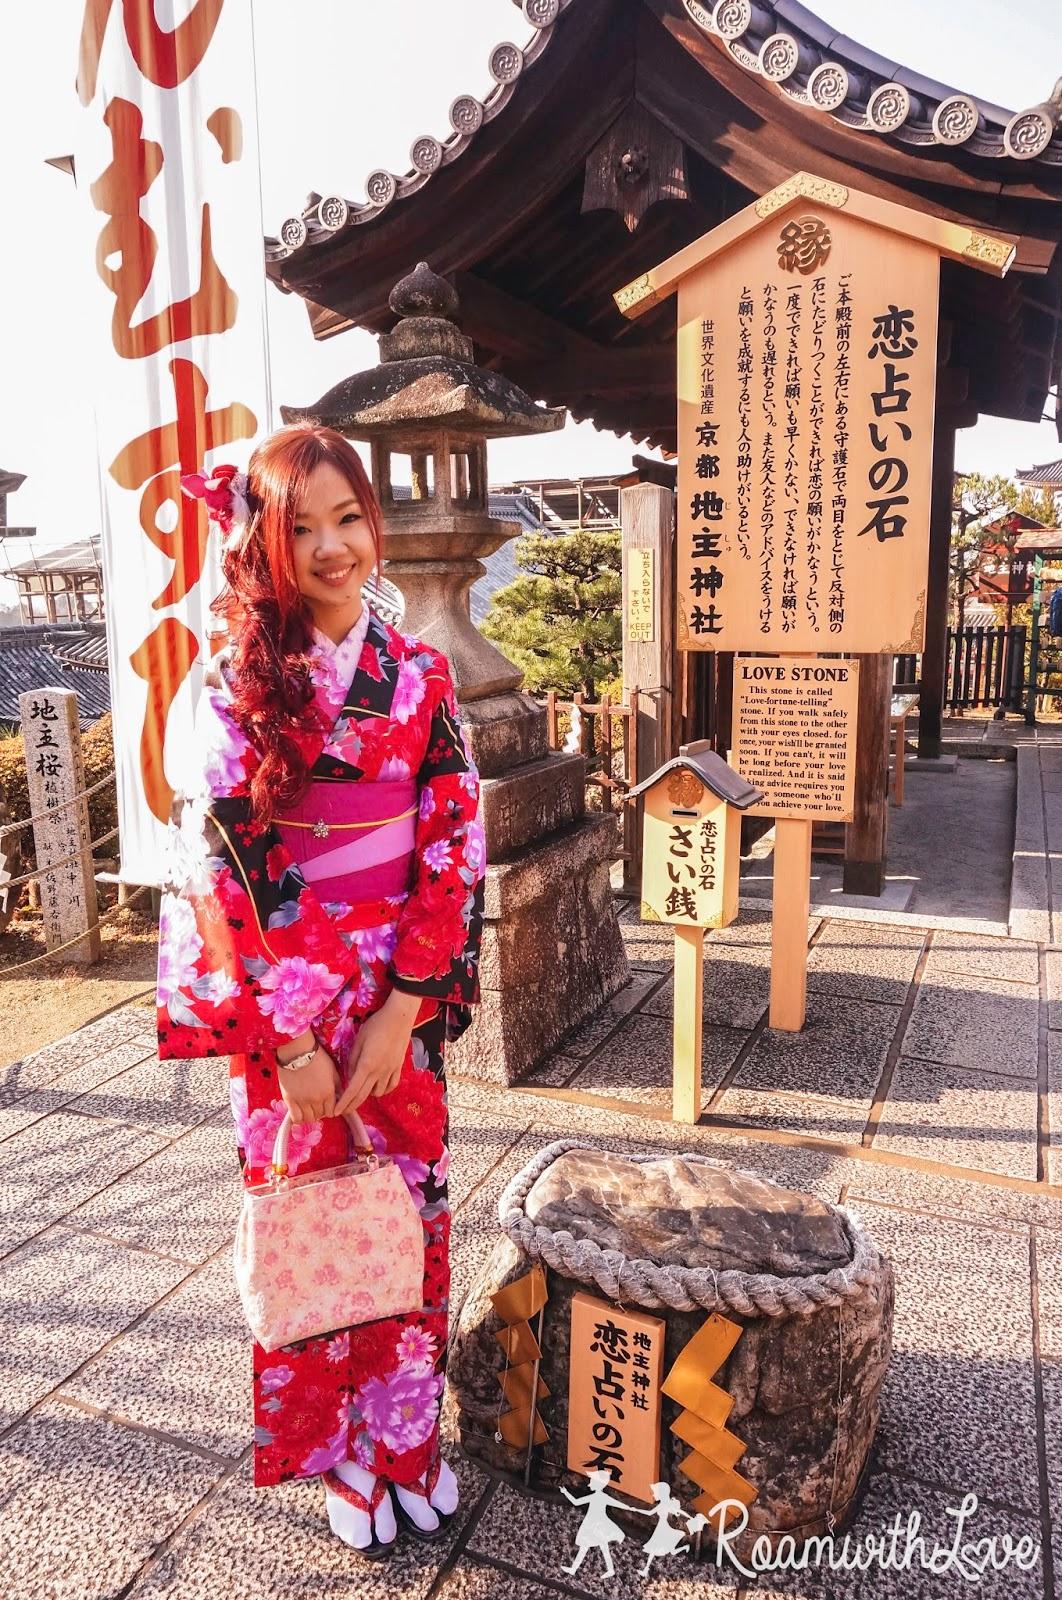 Japan,kyoto,review,เกีนวโต,รีวิว,ทริป,สวีท,ญี่ปุ่น,คันไซ,วัดน้ำใส,คิโยมิซึ,Kiyomizu,Jishu,ศาลเจ้าความรัก